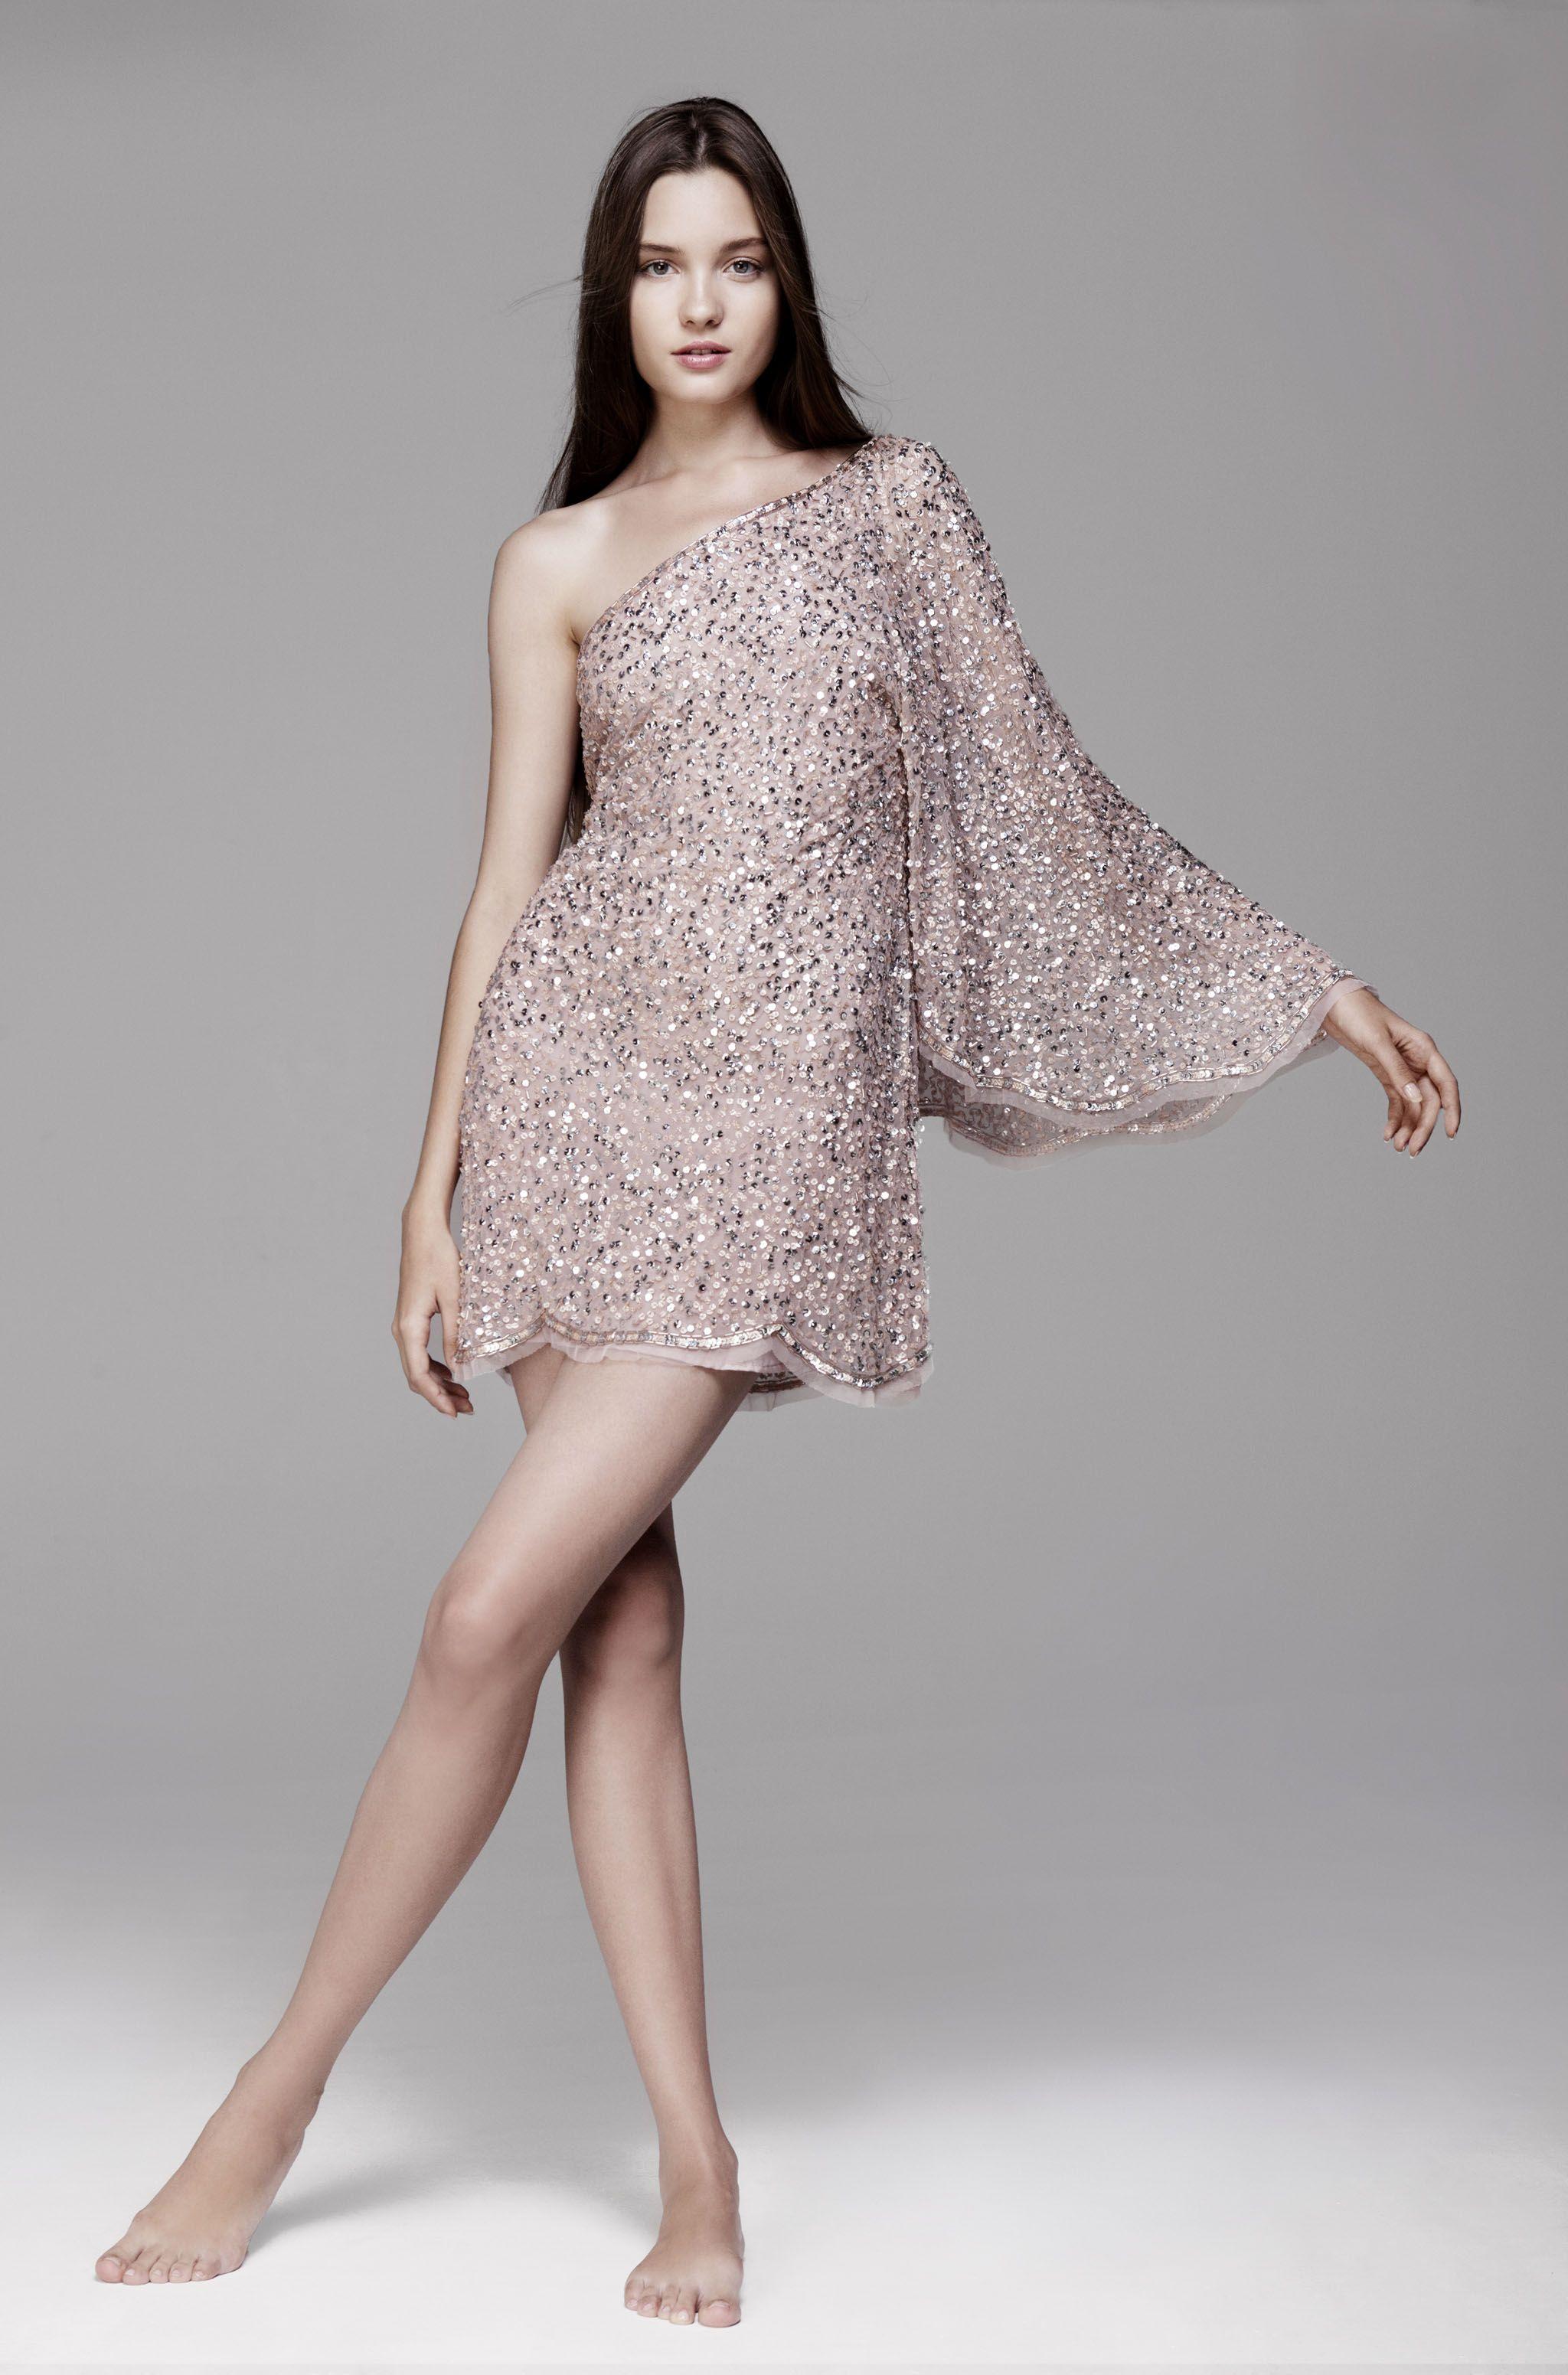 Vestido Corto Lentejuelas Short Dress Sequence Evening Look